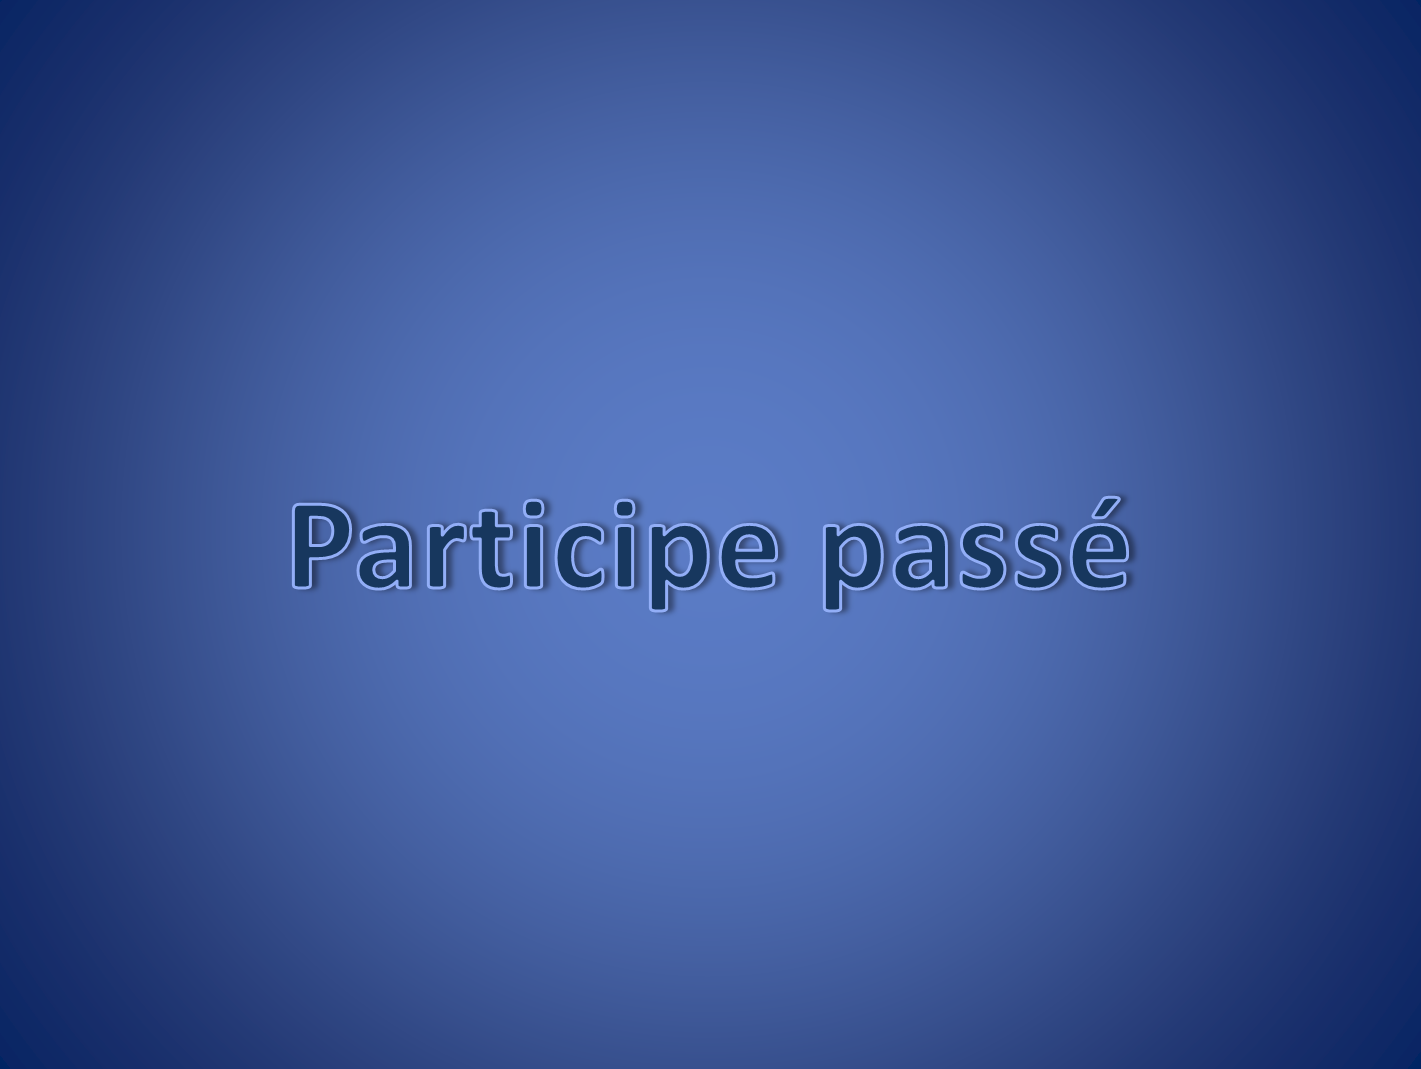 Participe passé — Հարակատար դերբայ